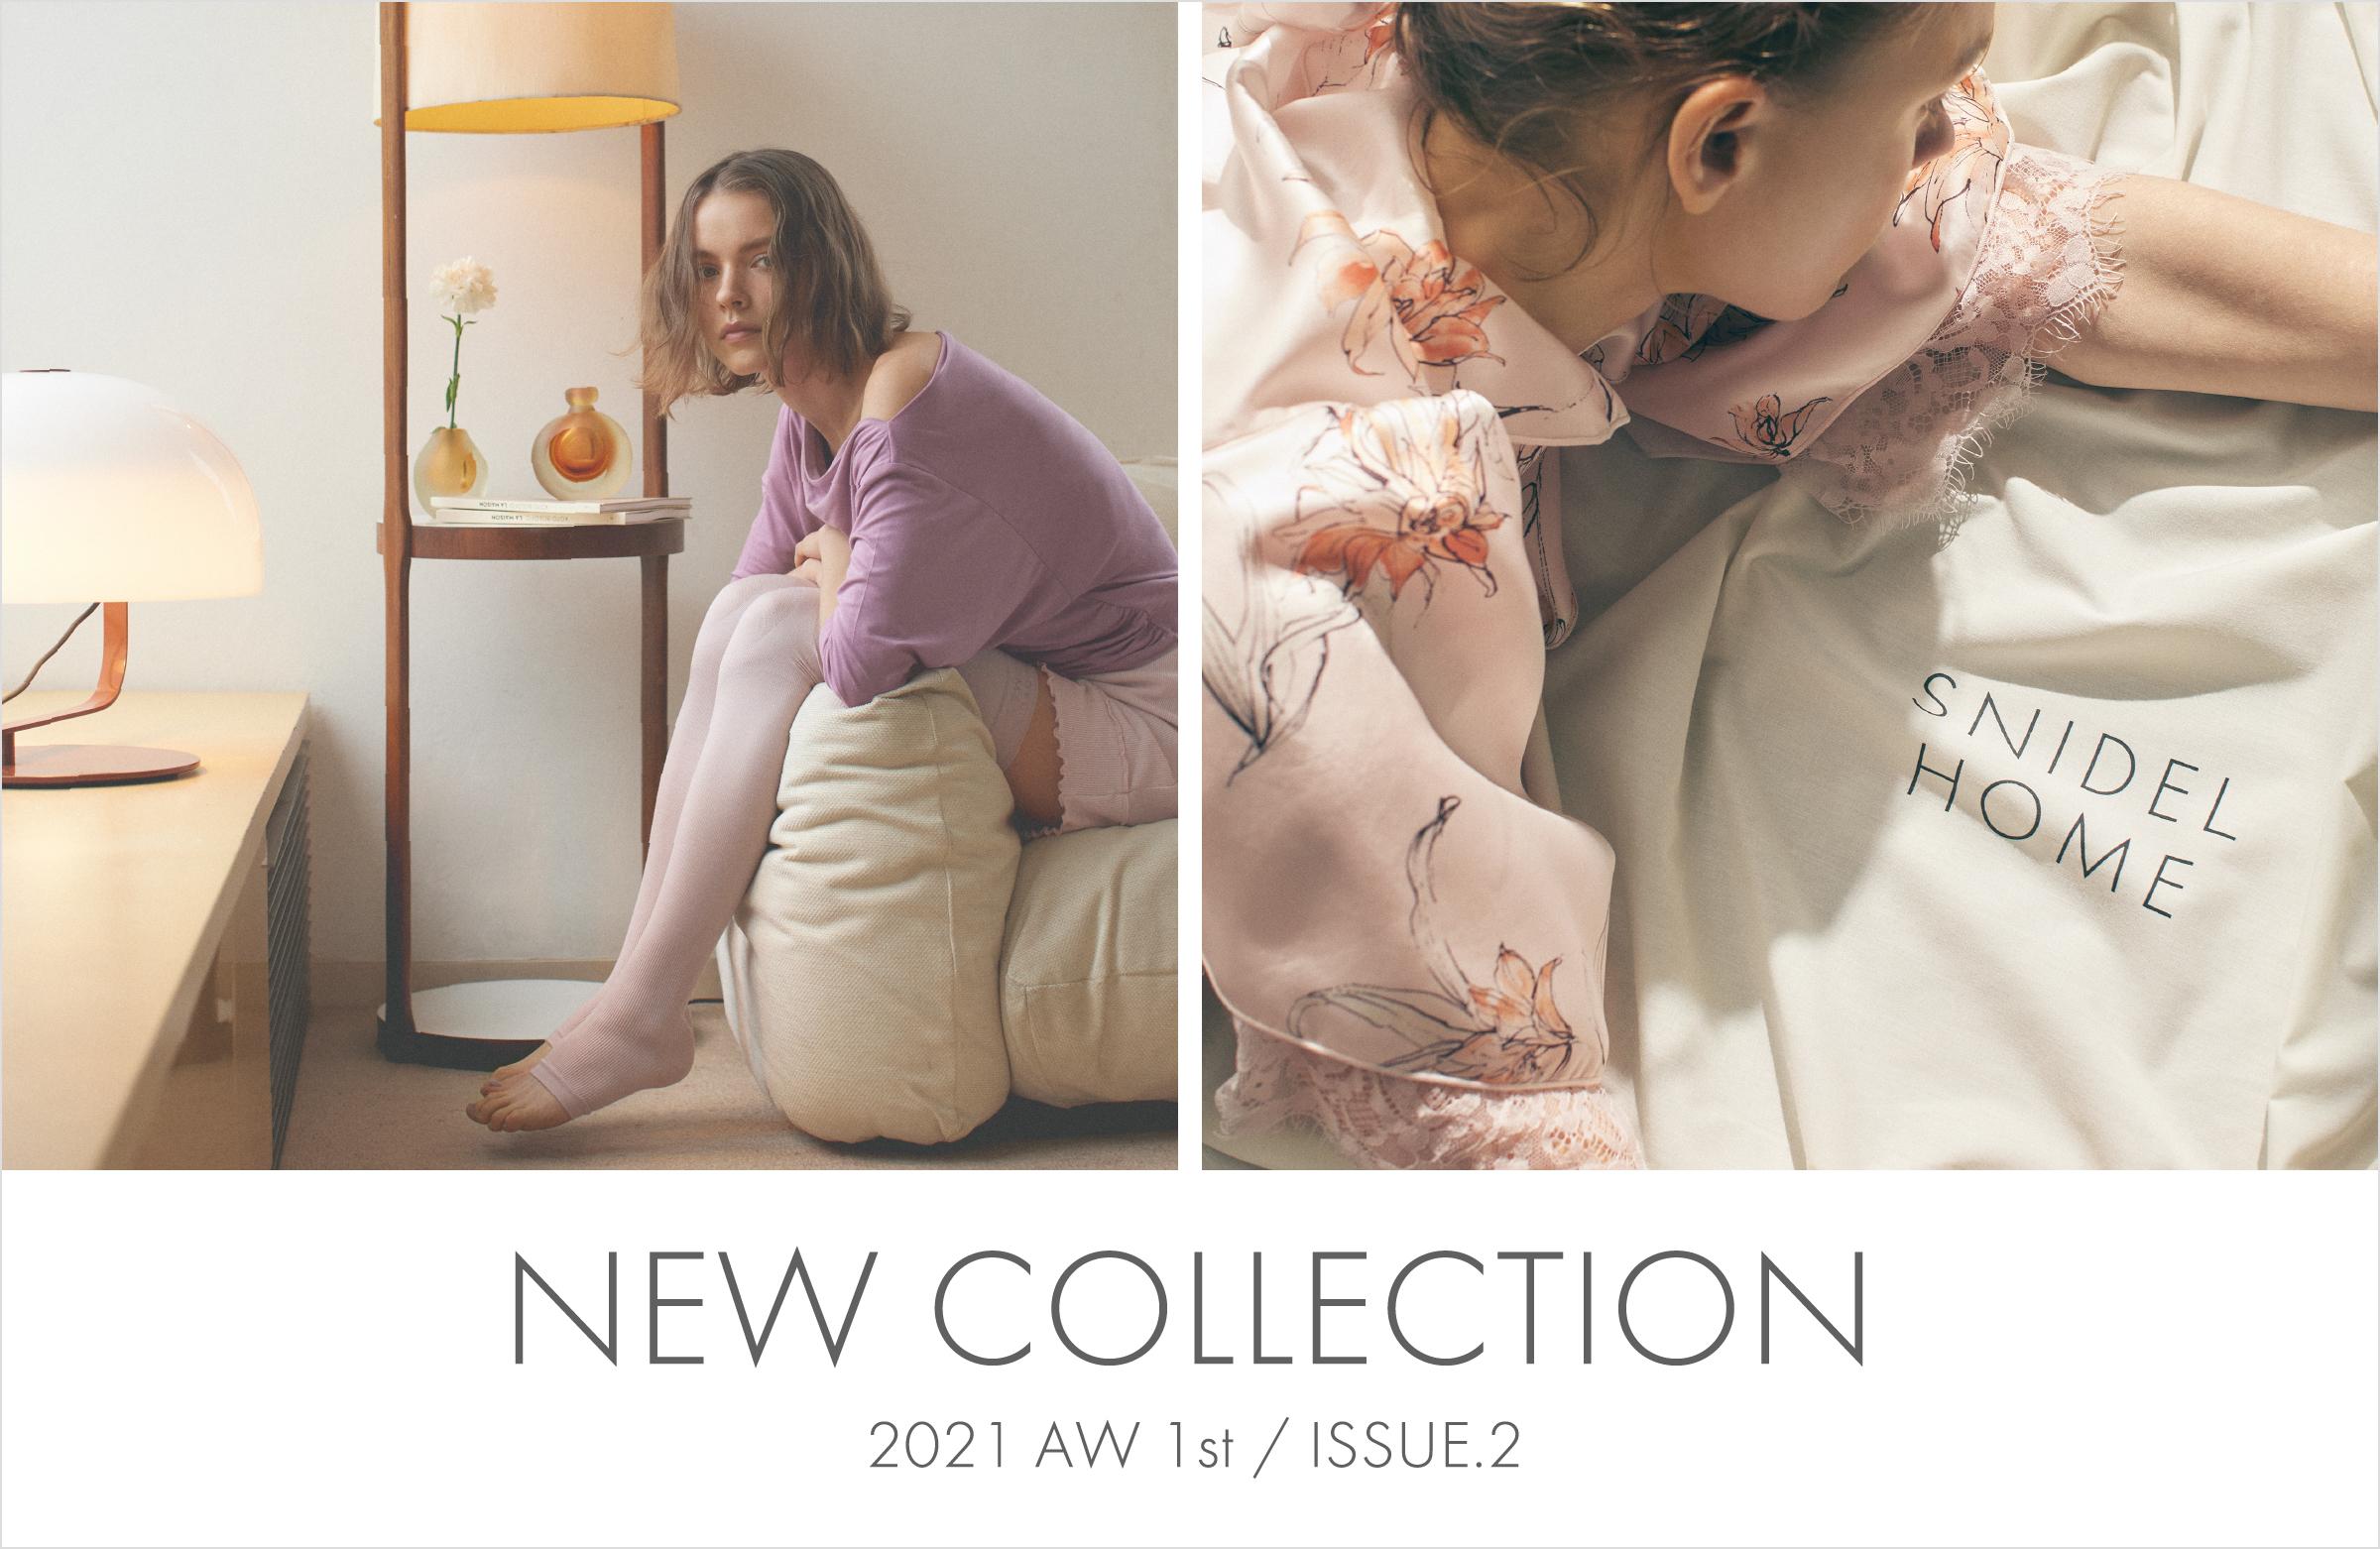 catalog ISSUE.2 / September Optimistic new daily life ポジティブな自分だけの時間を